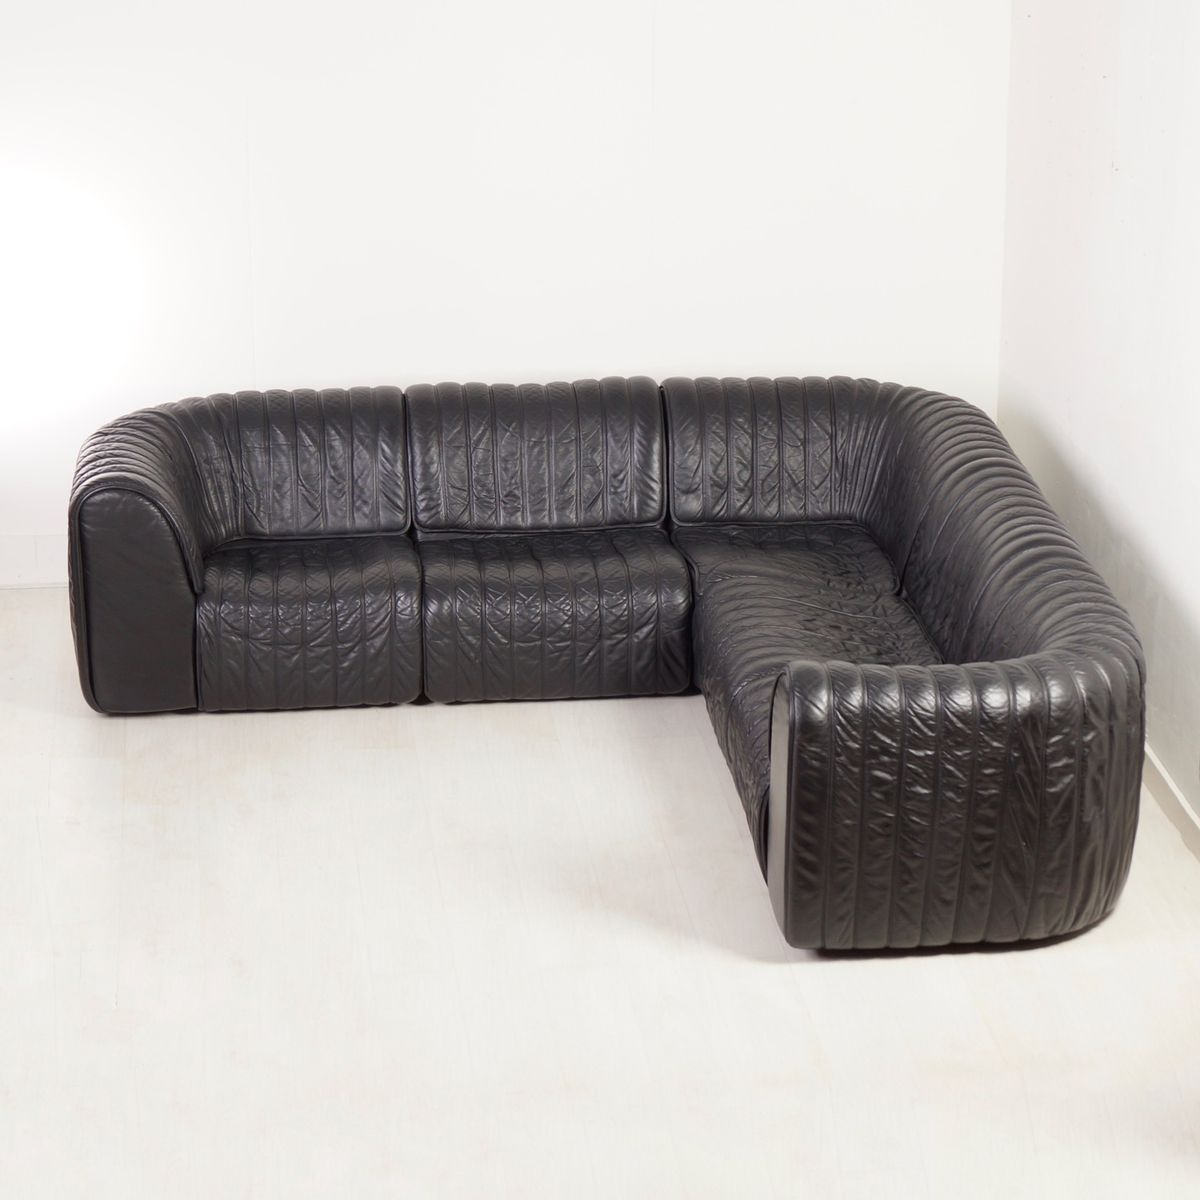 ds 22 eckbank aus schwarzem leder von de sede 1980er bei pamono kaufen. Black Bedroom Furniture Sets. Home Design Ideas